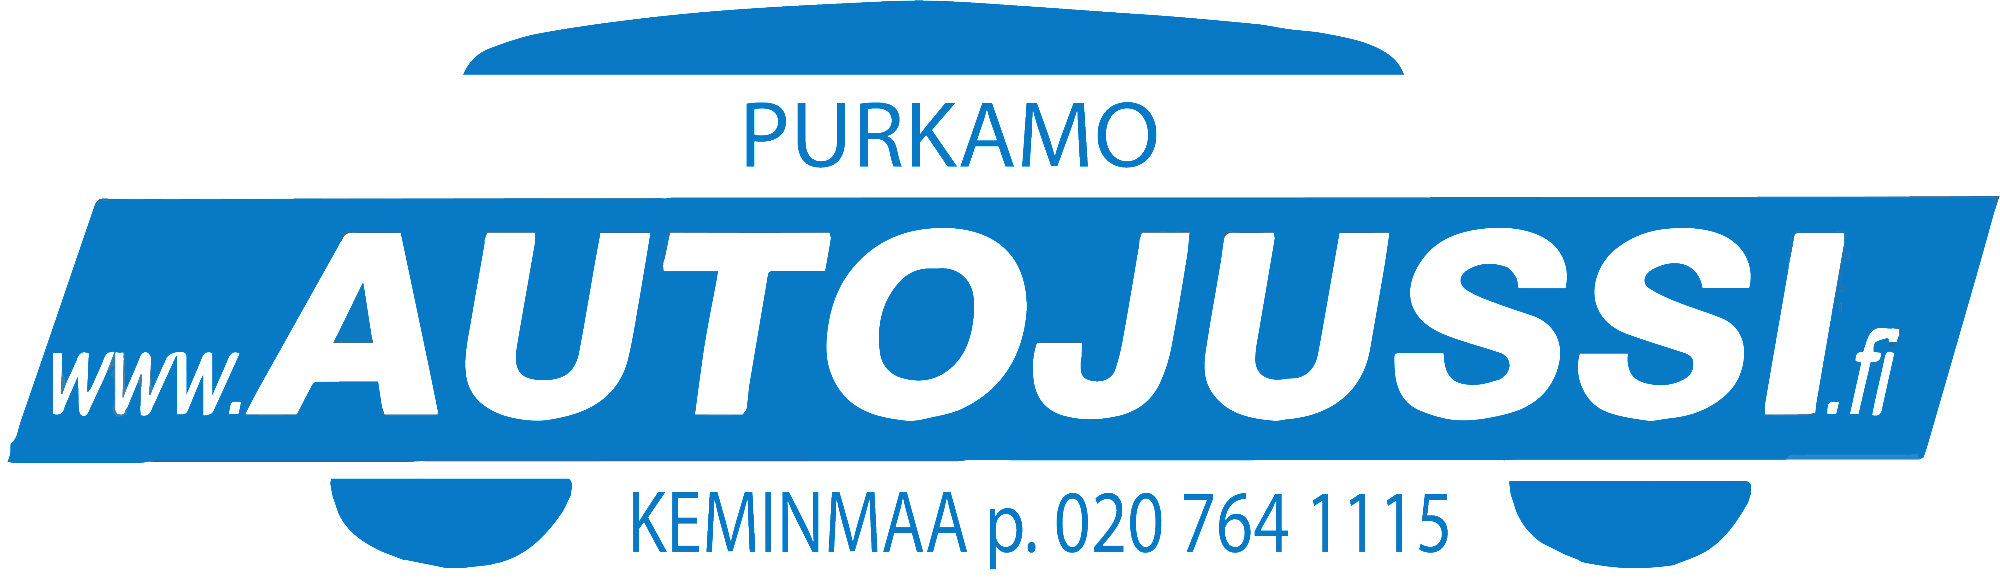 autojussi logo taustaton